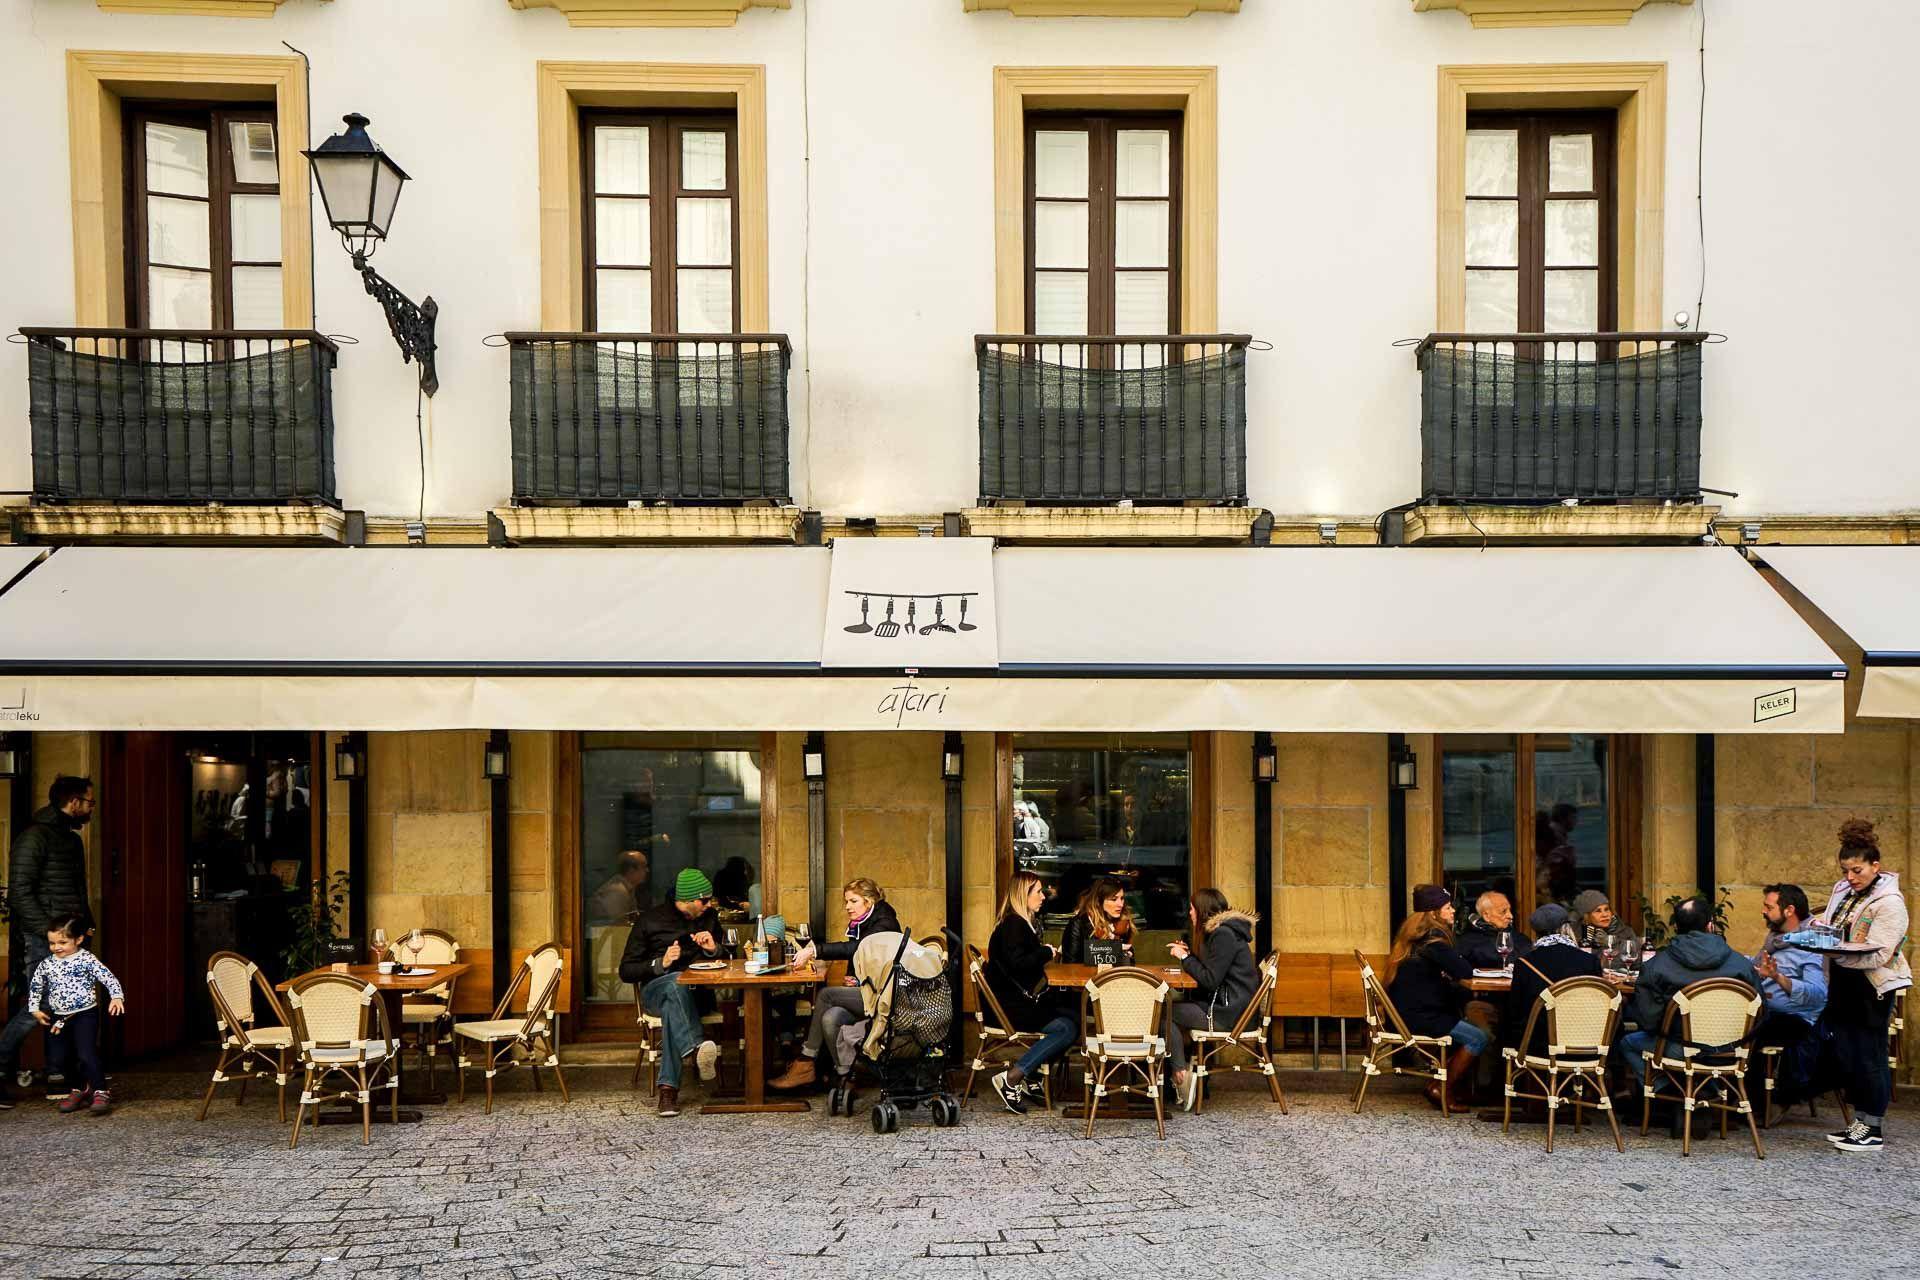 San Sebastian Les 10 Meilleurs Bars A Pintxos De La Ville San Sebastian Saint Sebastien Espagne Seville Espagne